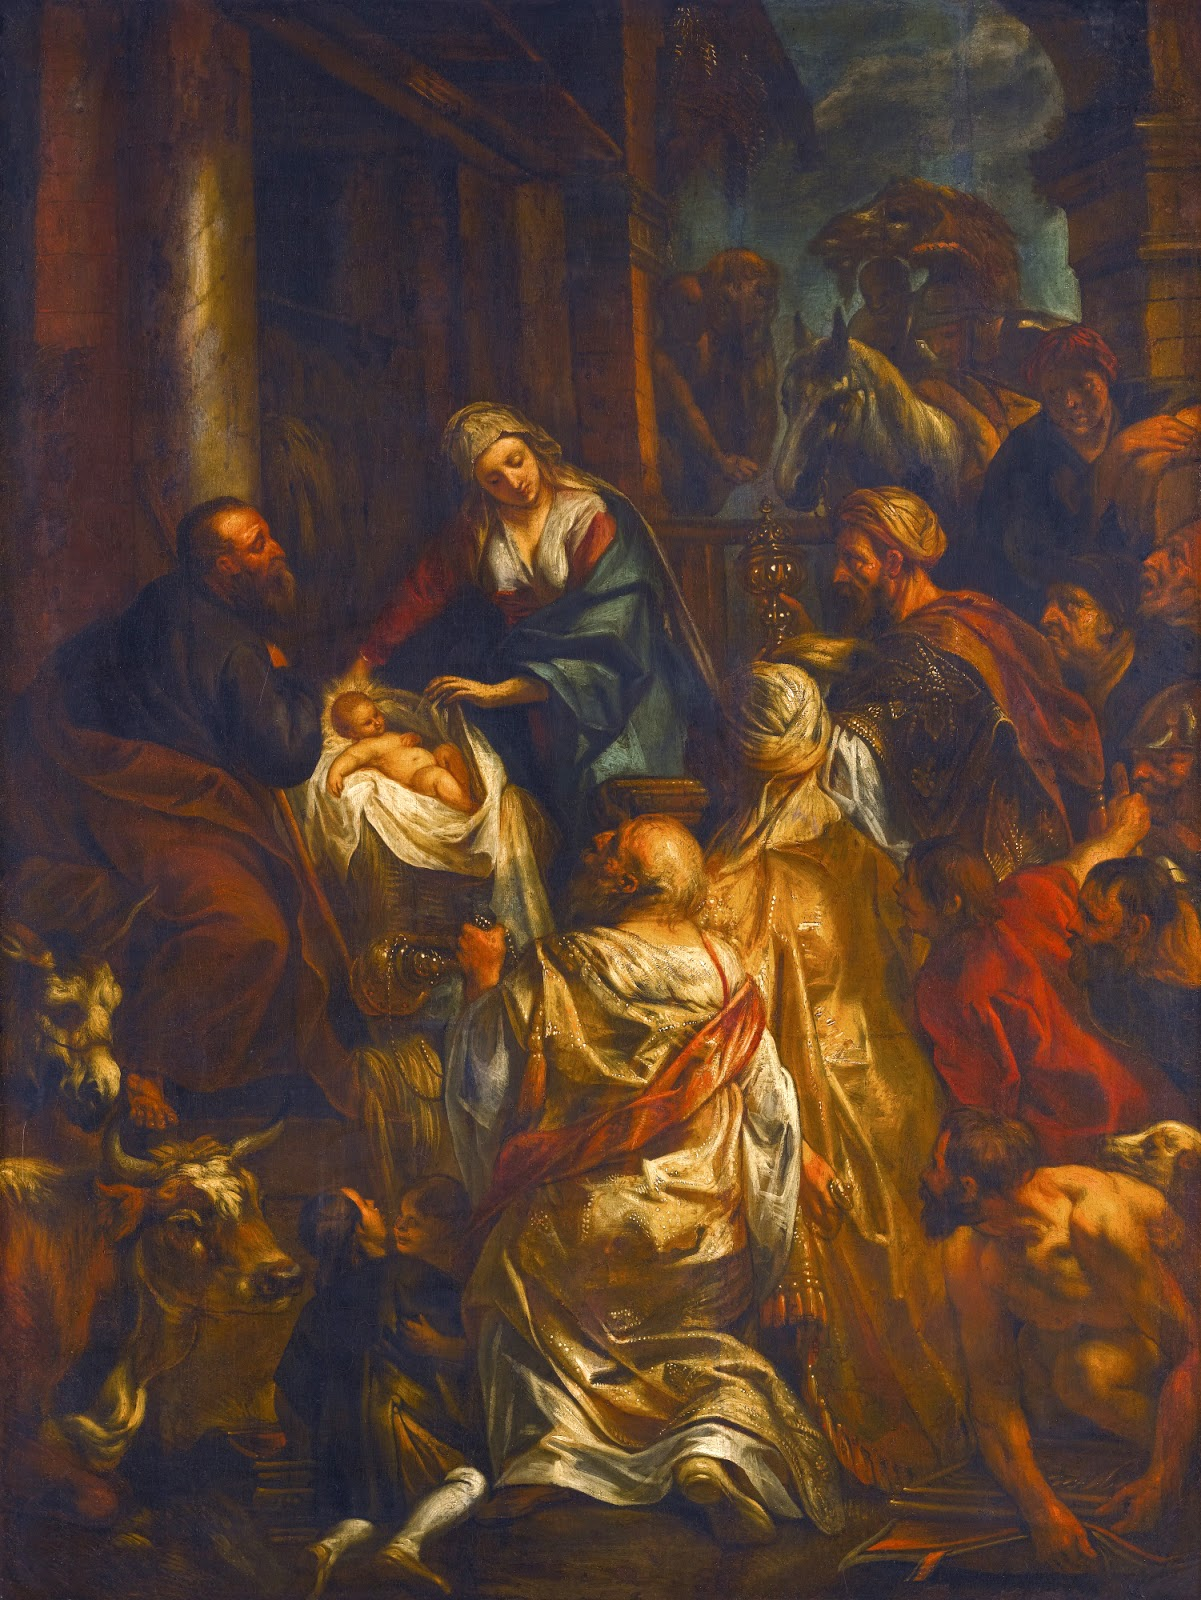 Jacob jordaens baroque era painter tutt 39 art pittura for Famous artist in baroque period